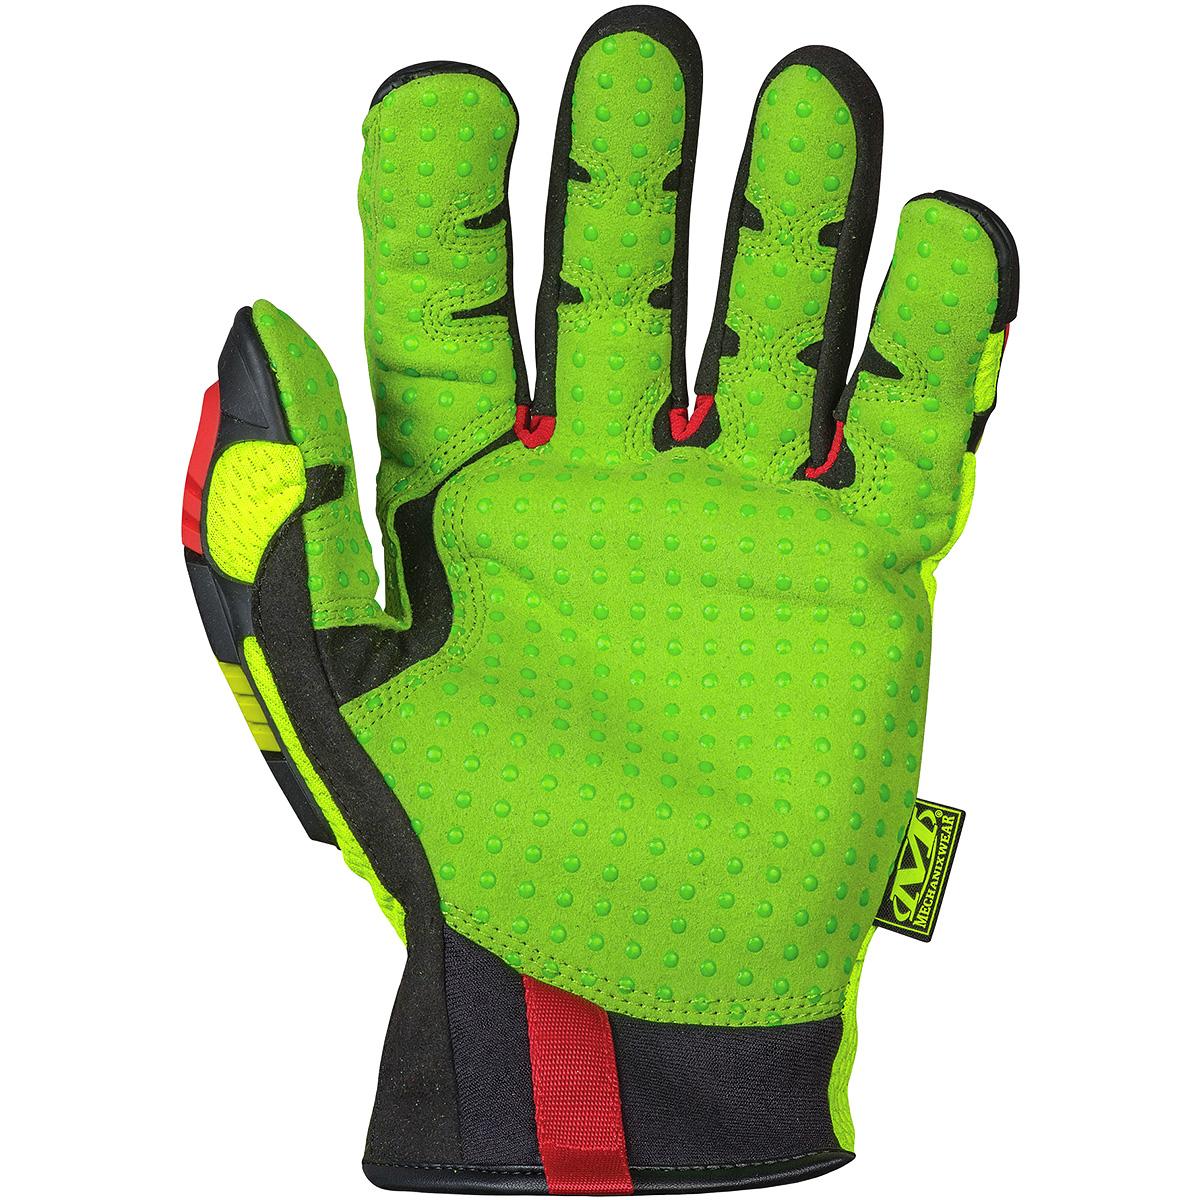 Mens yellow gloves - Sentinel Mechanix Wear The Safety M Pact Orhd Padded Mens Work Gloves Hi Viz Yellow